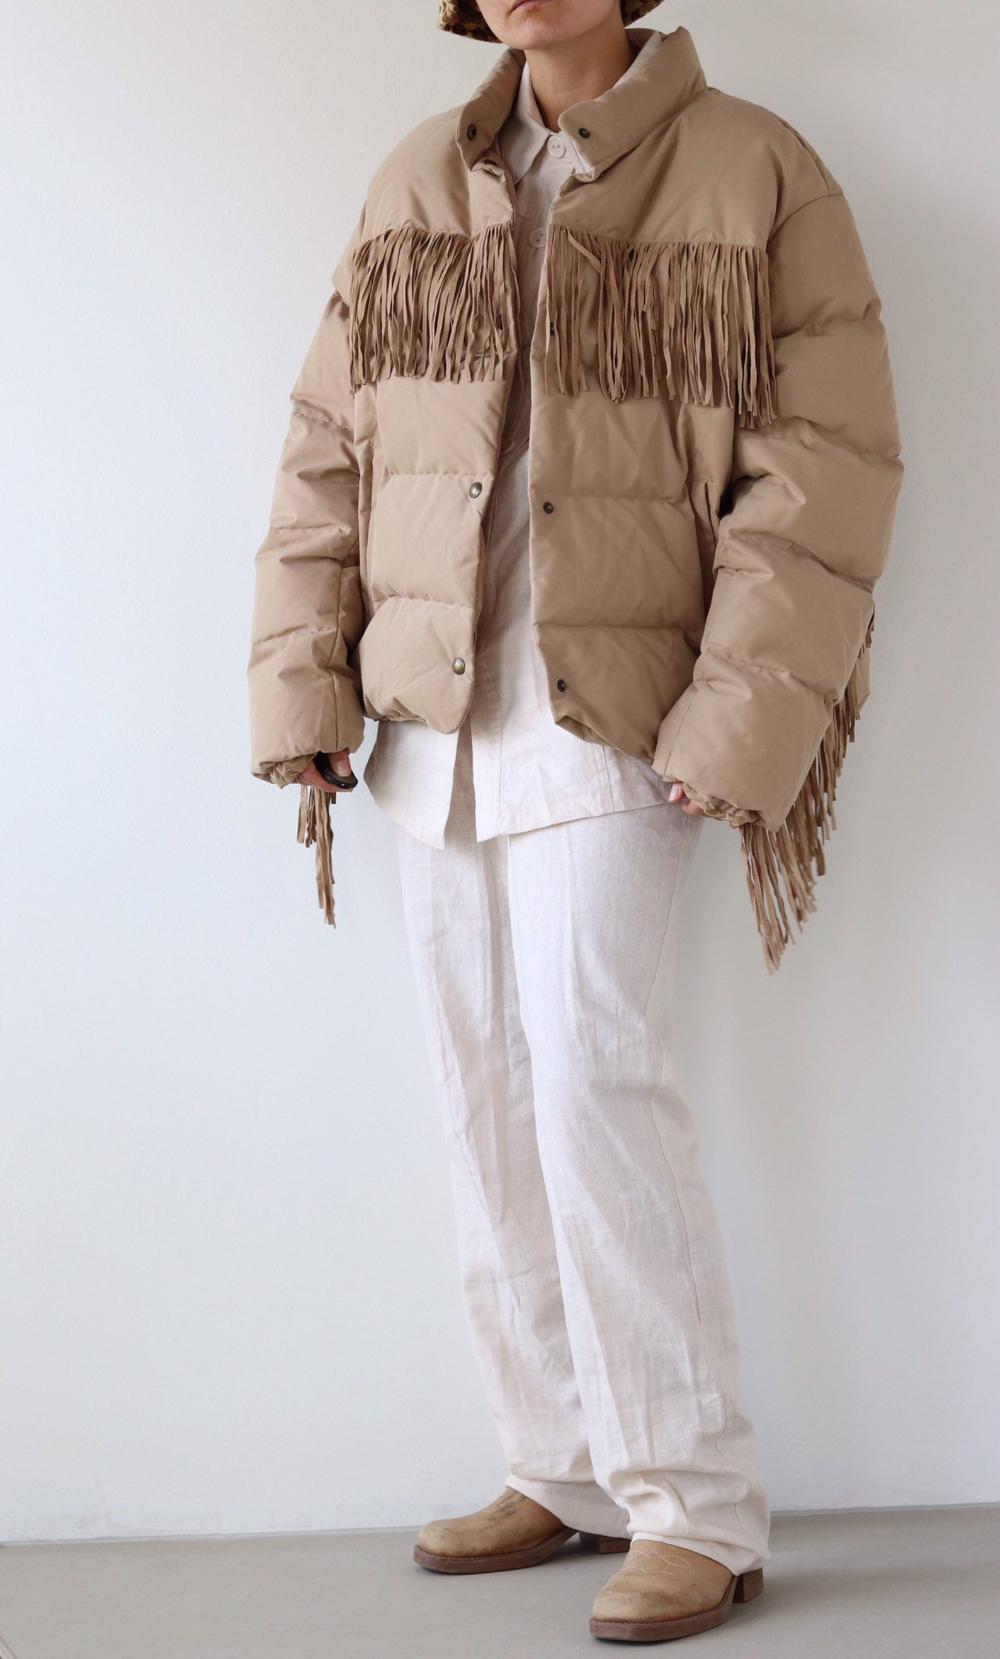 Ralph Lauren Polo Beige Western Fringed Puffer Jacket Etsy Polo Ralph Lauren Winter Jackets Ralph Lauren [ 1659 x 1000 Pixel ]